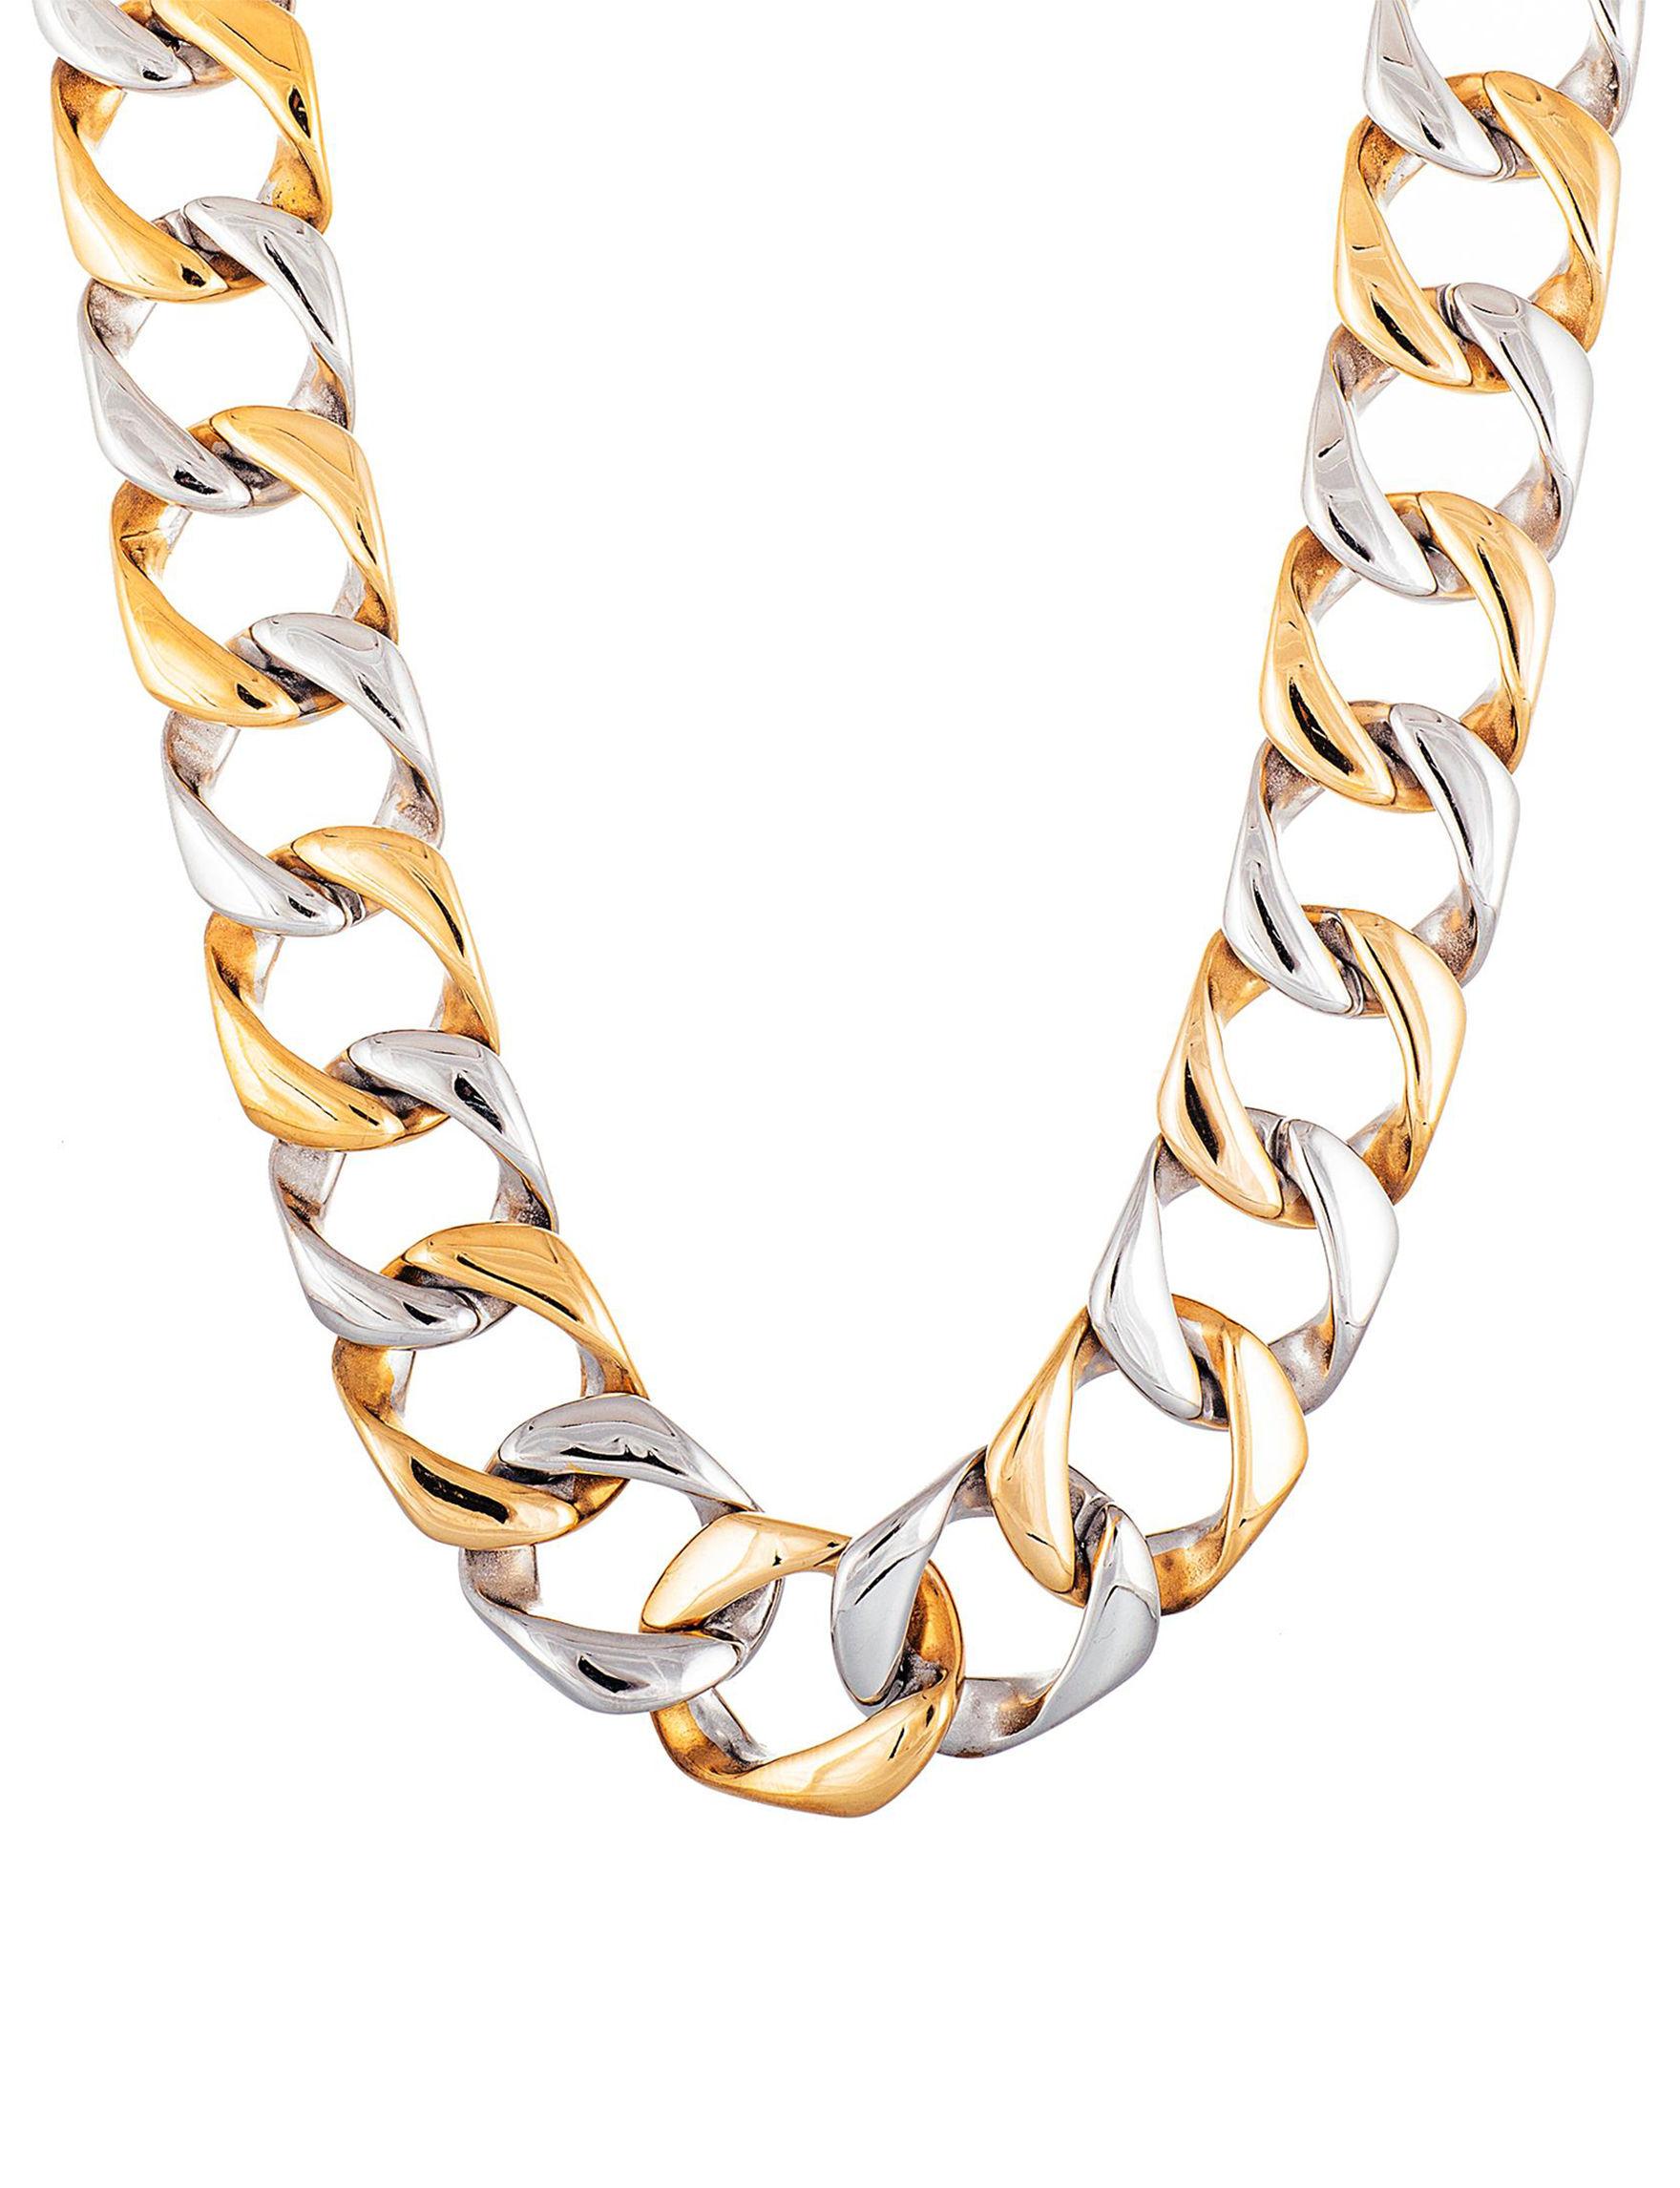 NES Steel/ Gold Necklaces & Pendants Fine Jewelry